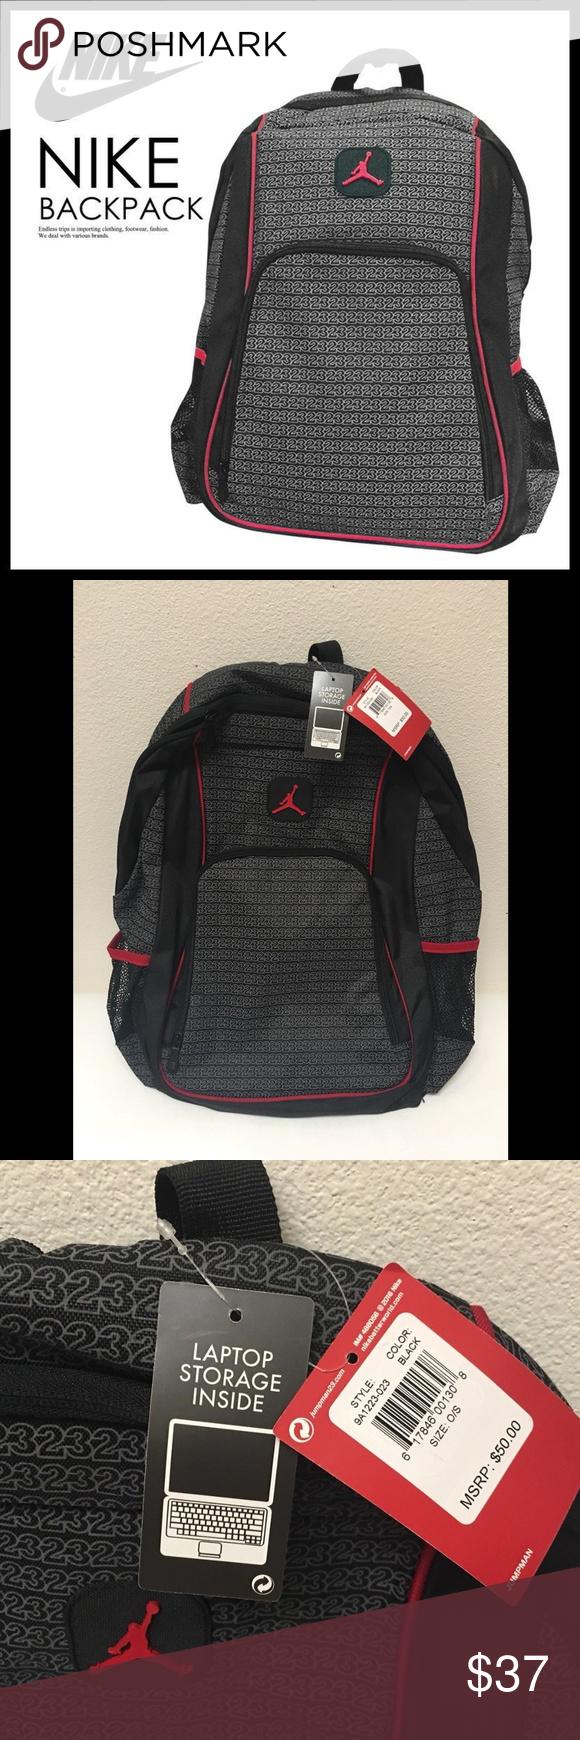 6deb9a1469 Nike Air Jordan Jumpman 23 Monogram Backpack Brand new with tag. Super fun!  Price firm. Nike Bags Backpacks